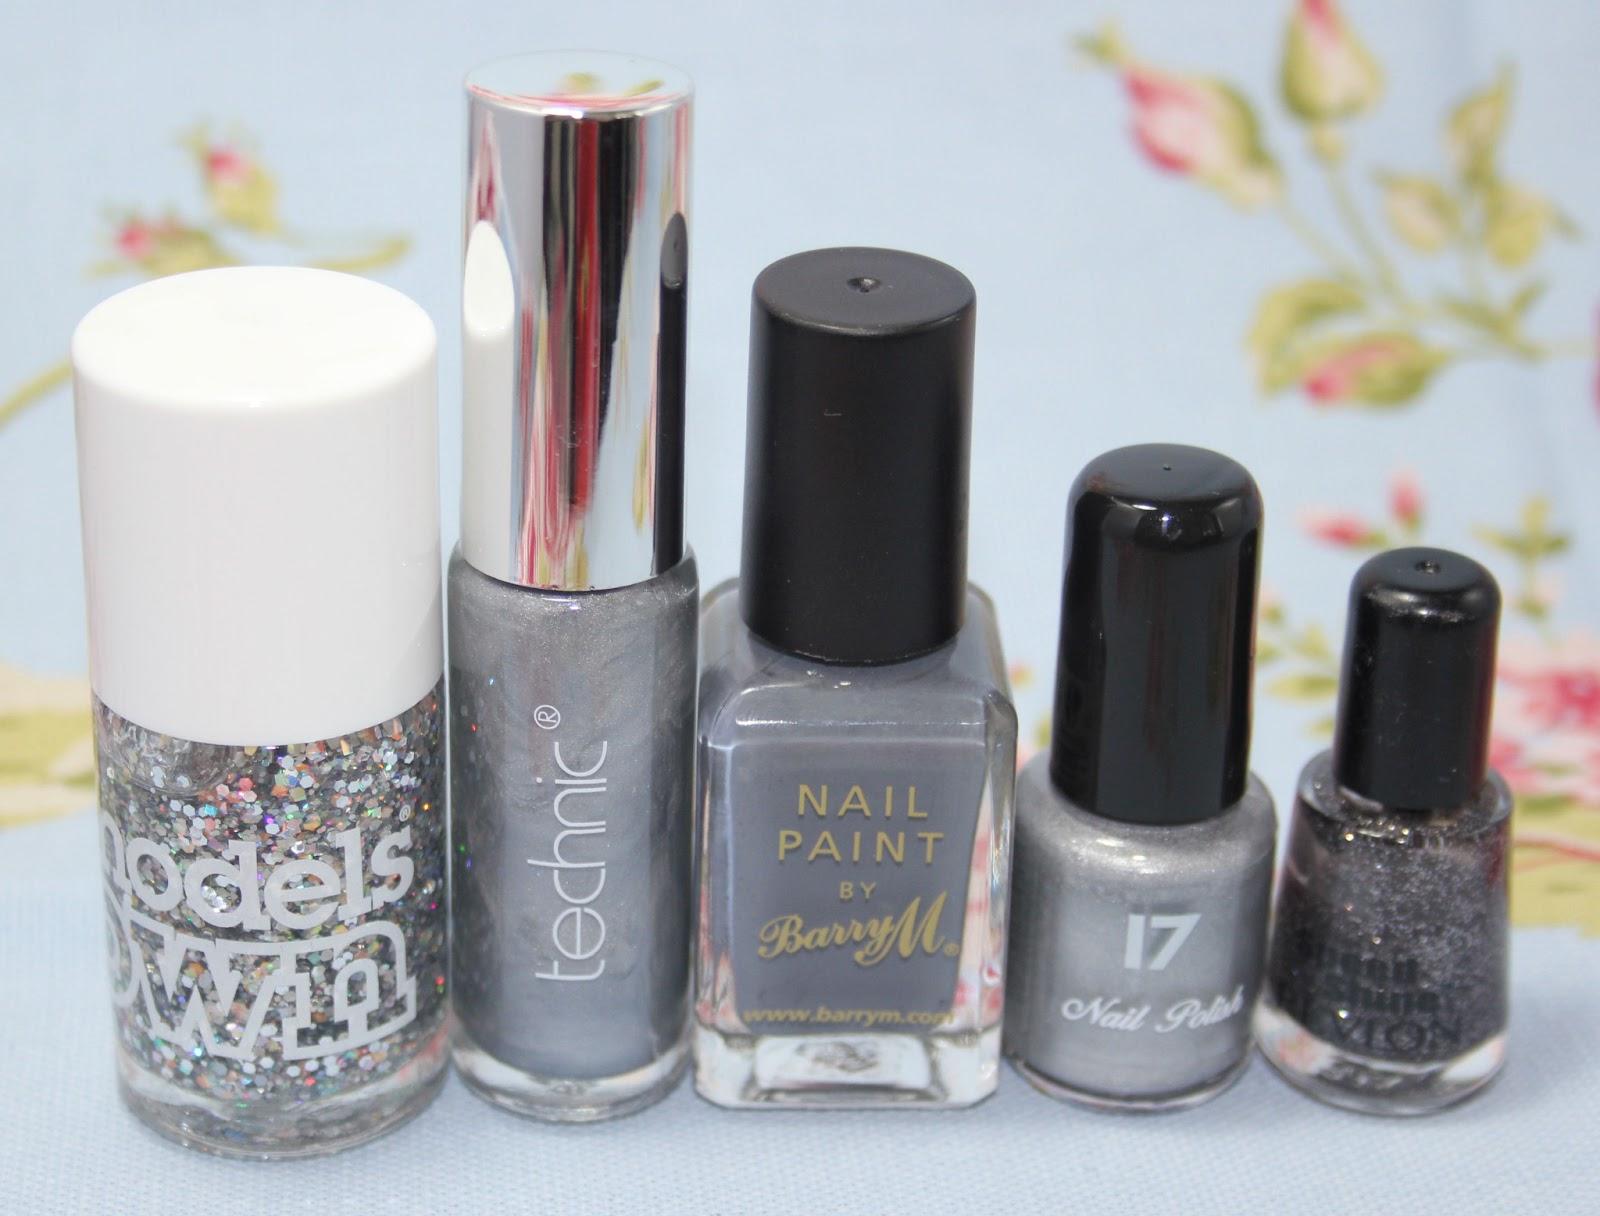 My nail polish collection - silver, grey & grurple - Love Leah